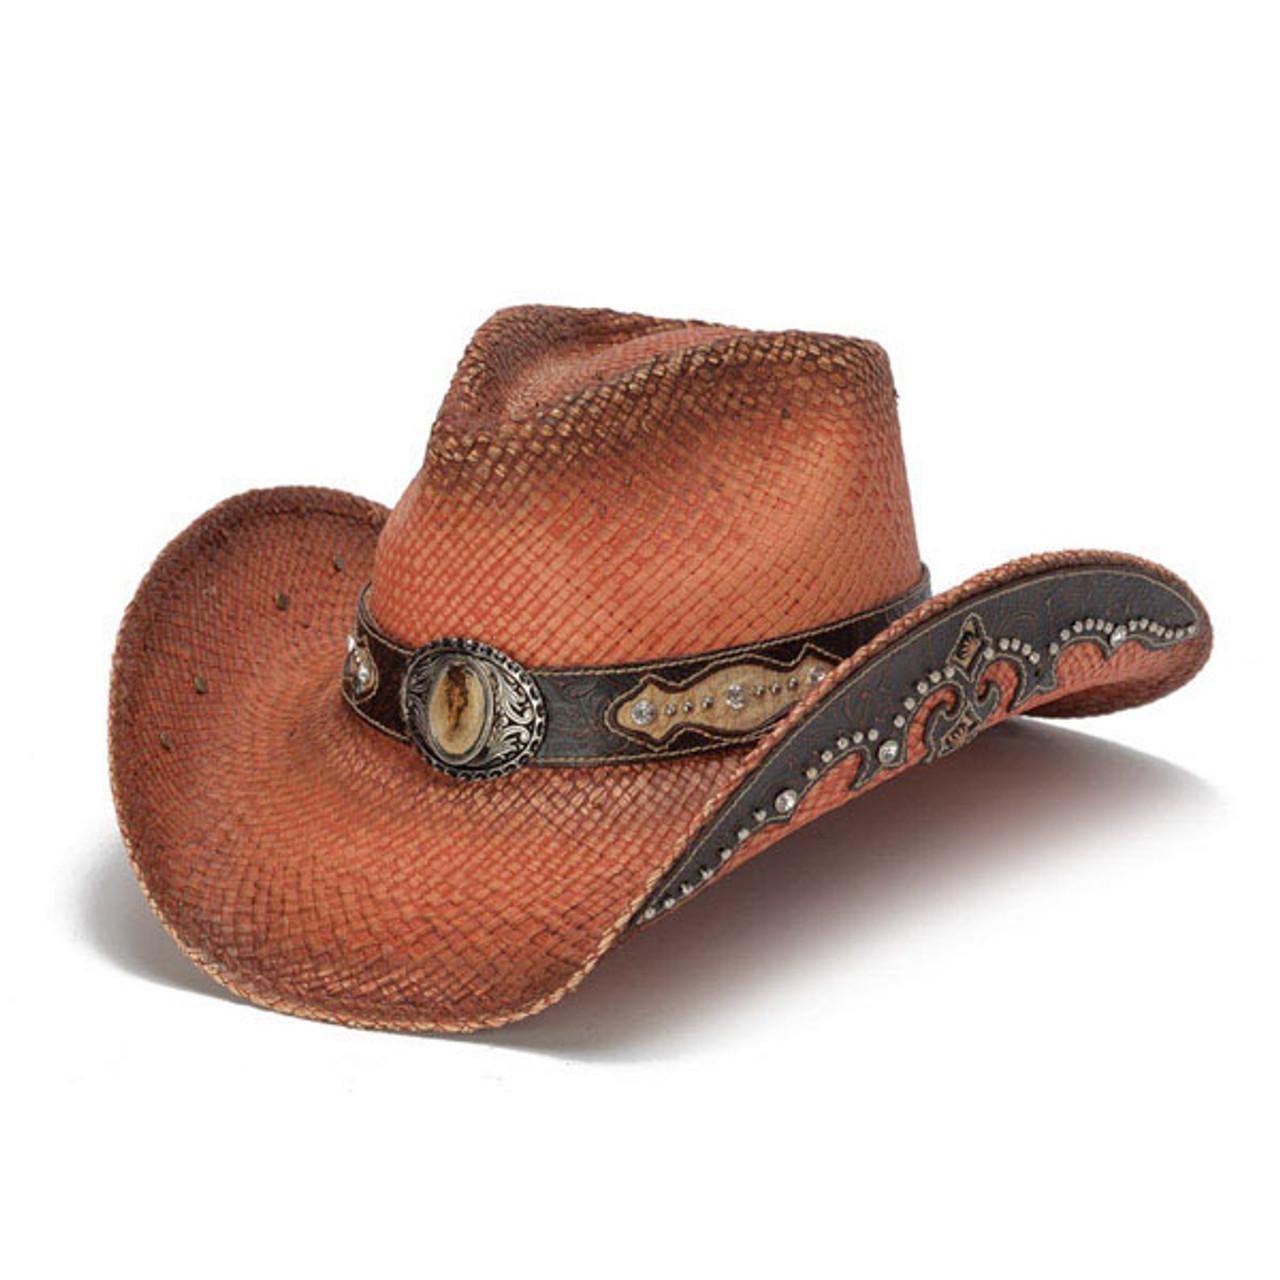 d407b500498381 Stampede Hats | Orange Rhinestone Cowboy Hat | Hats Unlimited